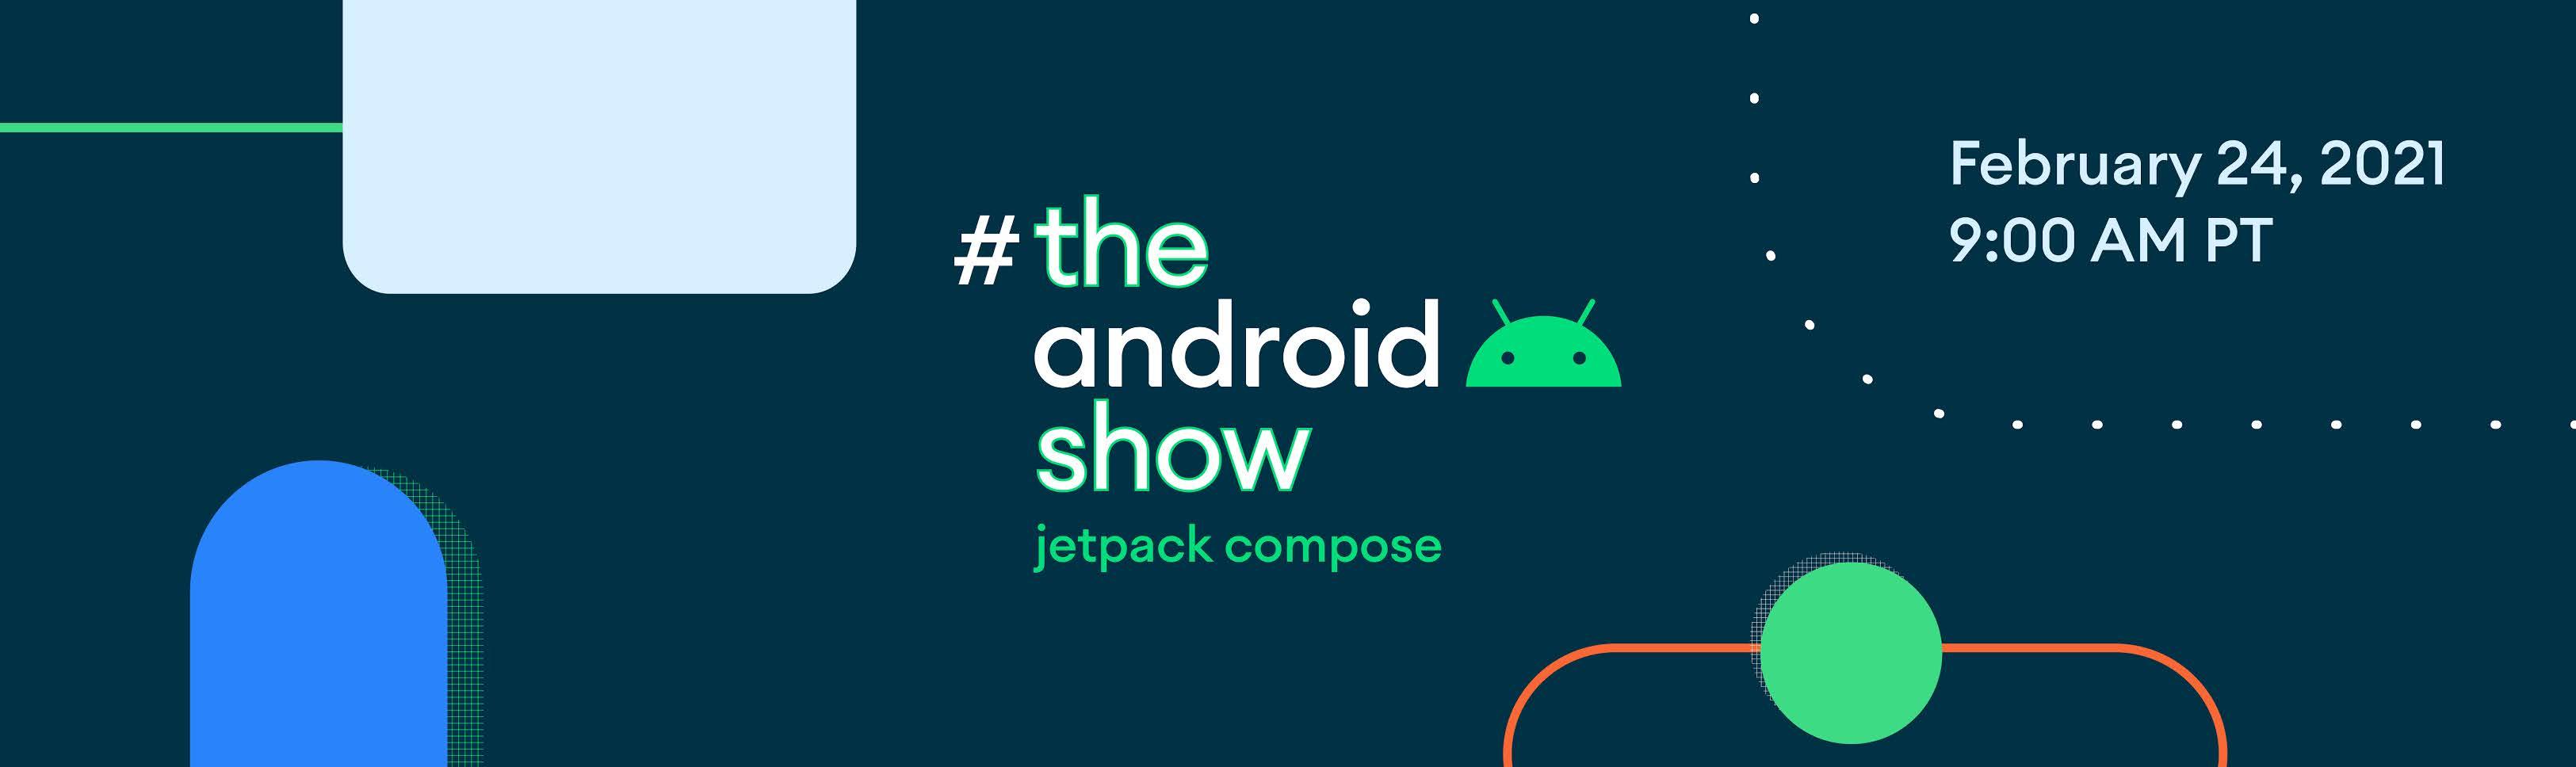 谷歌发布 Jetpack Compose Beta 版本